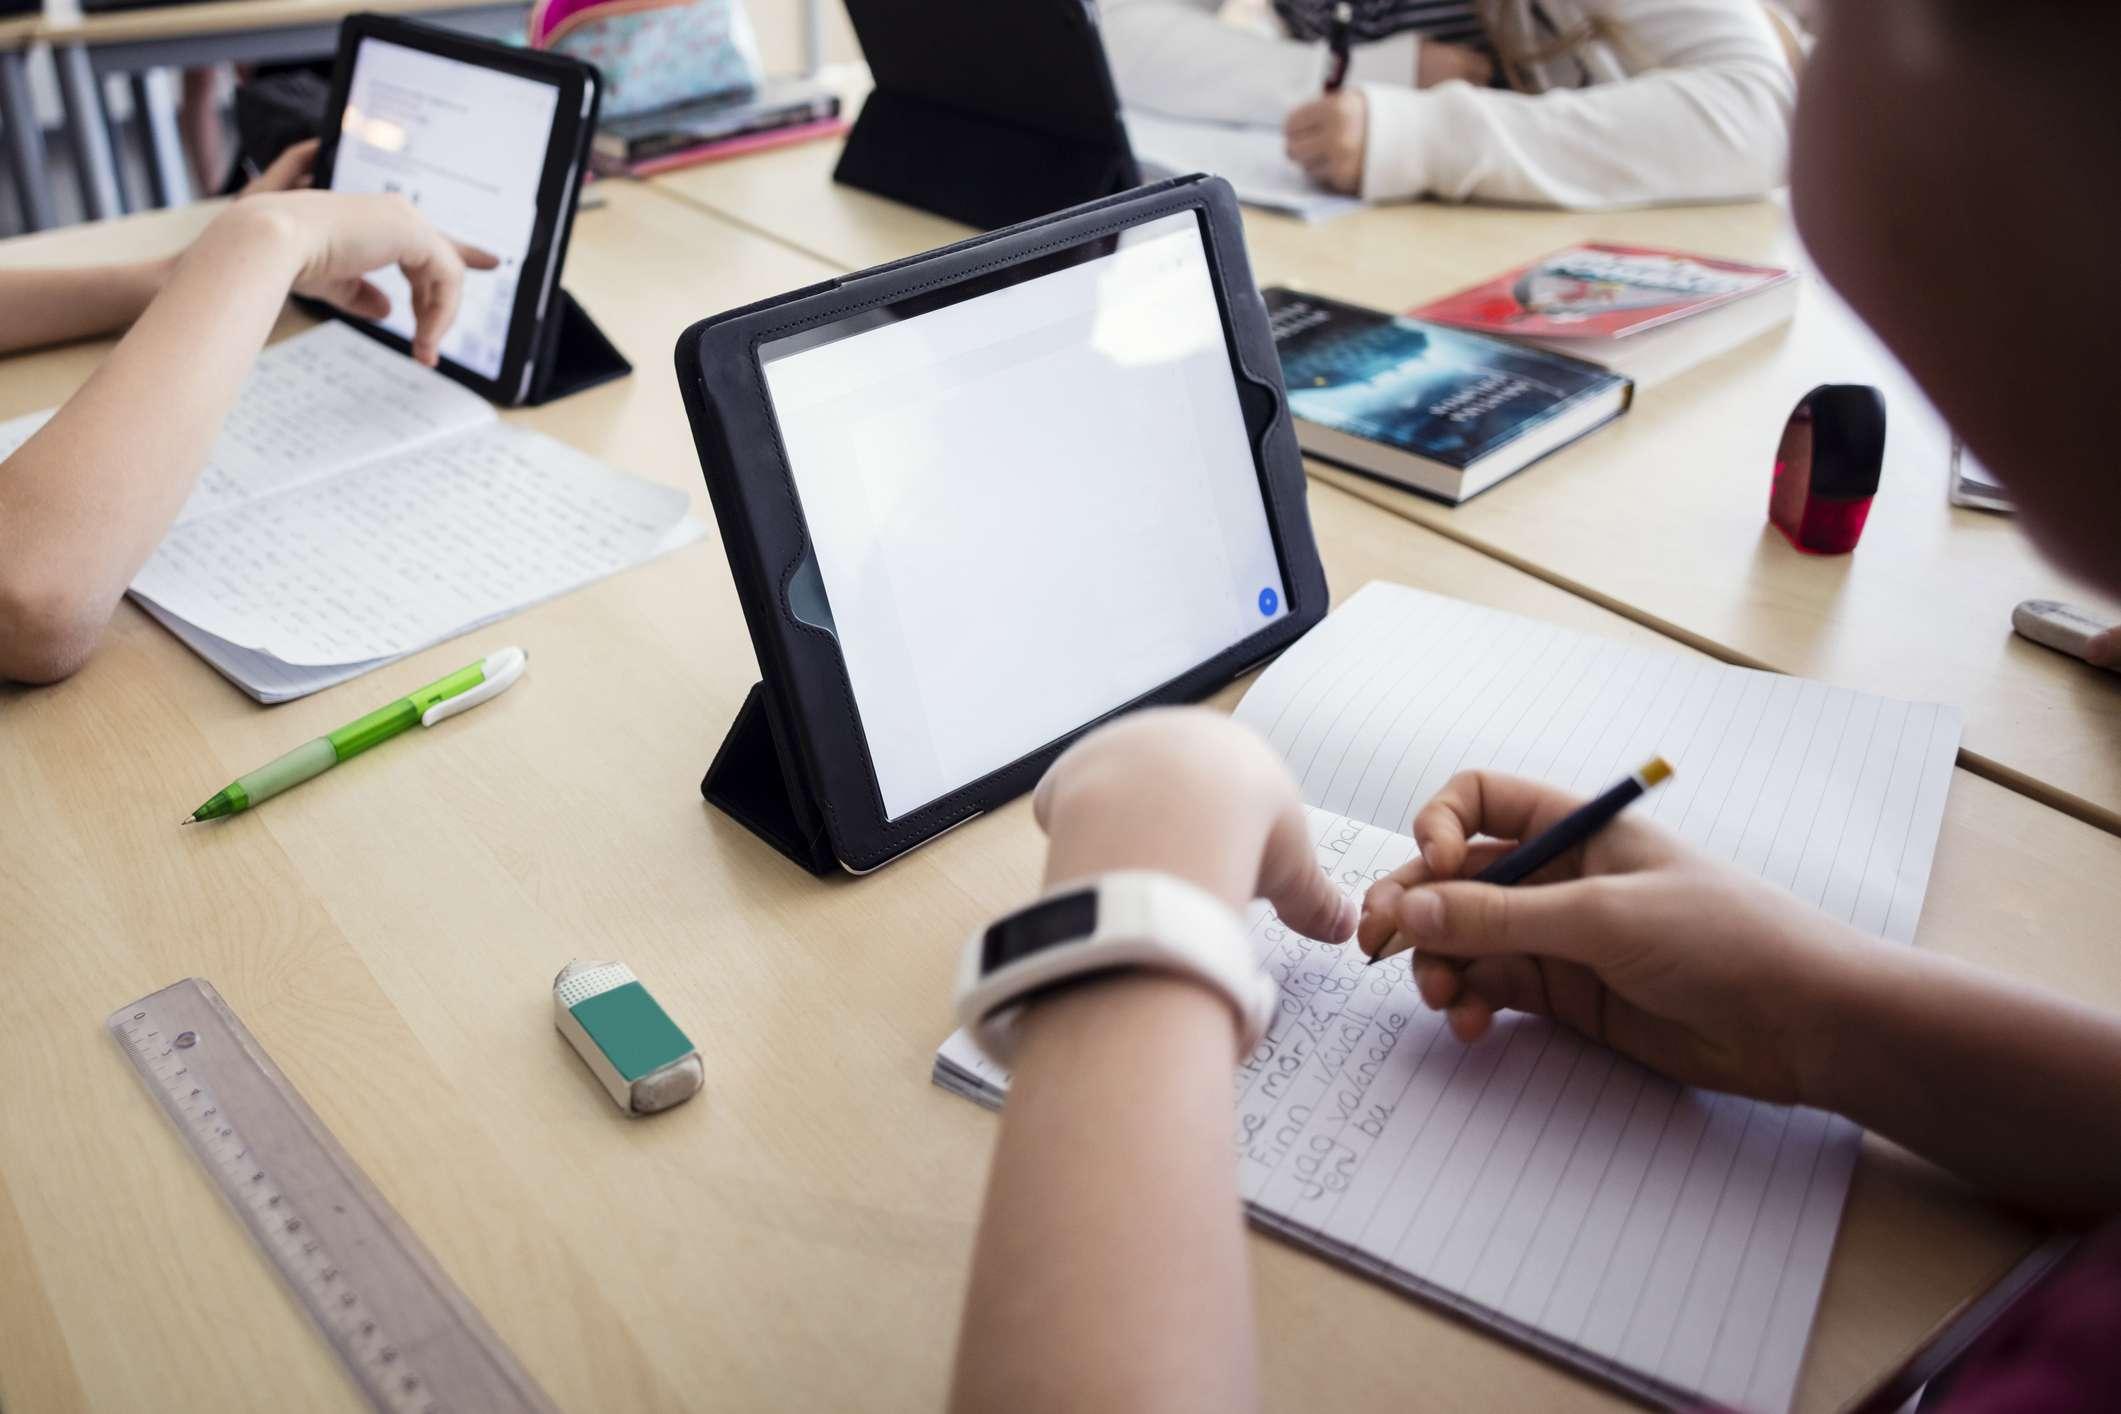 Children using iPad in the classroom.